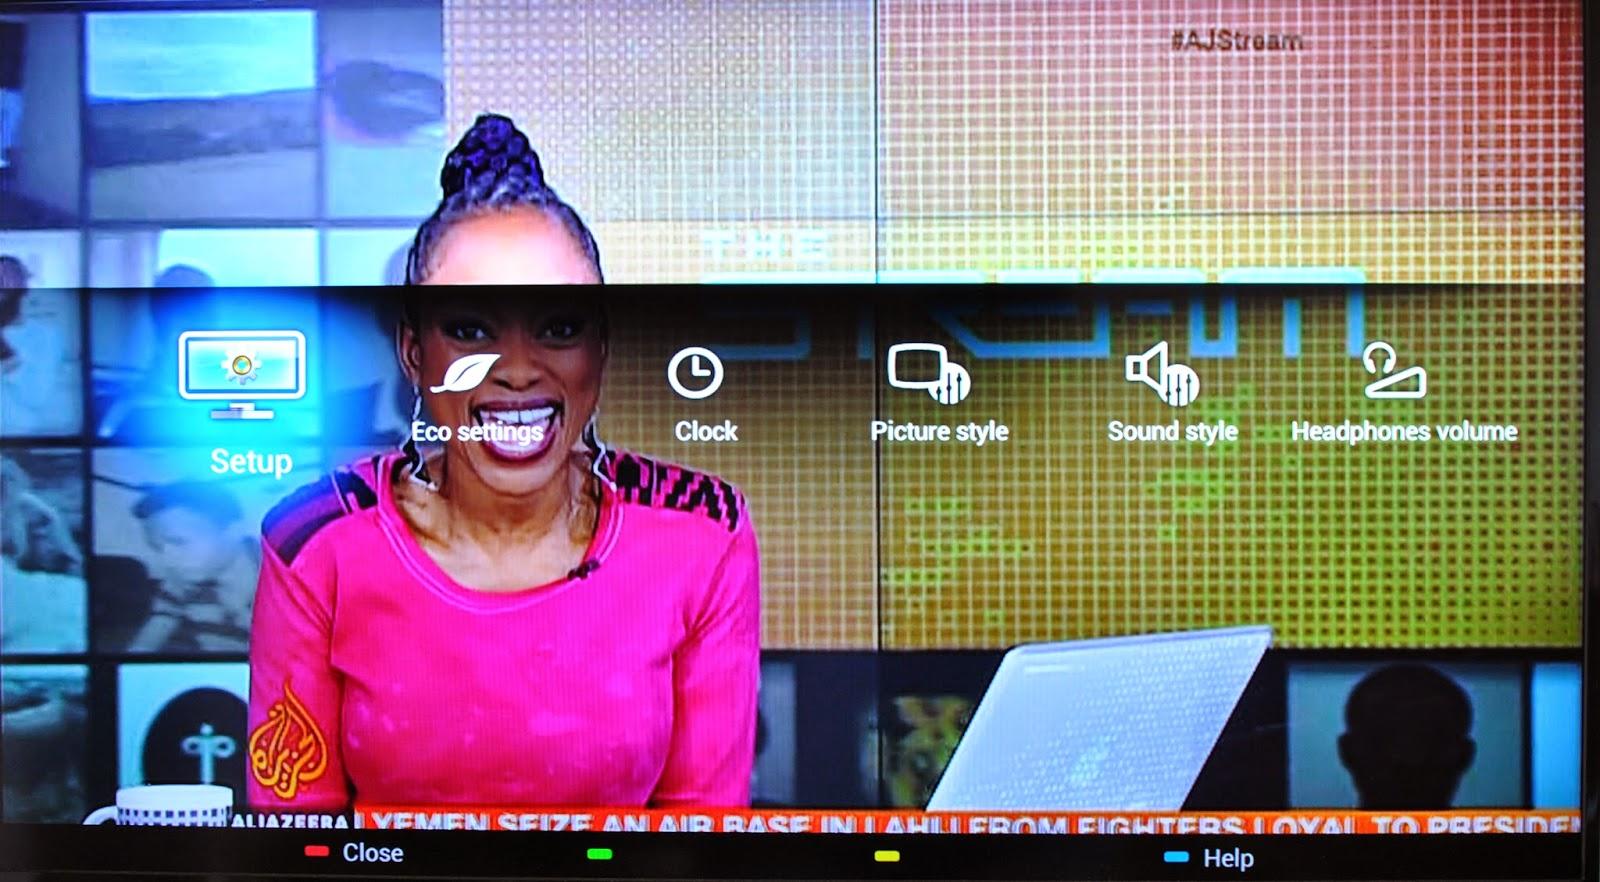 SmartTV%2BPhilips%2BMenu%2B-%2BSetup.JPG